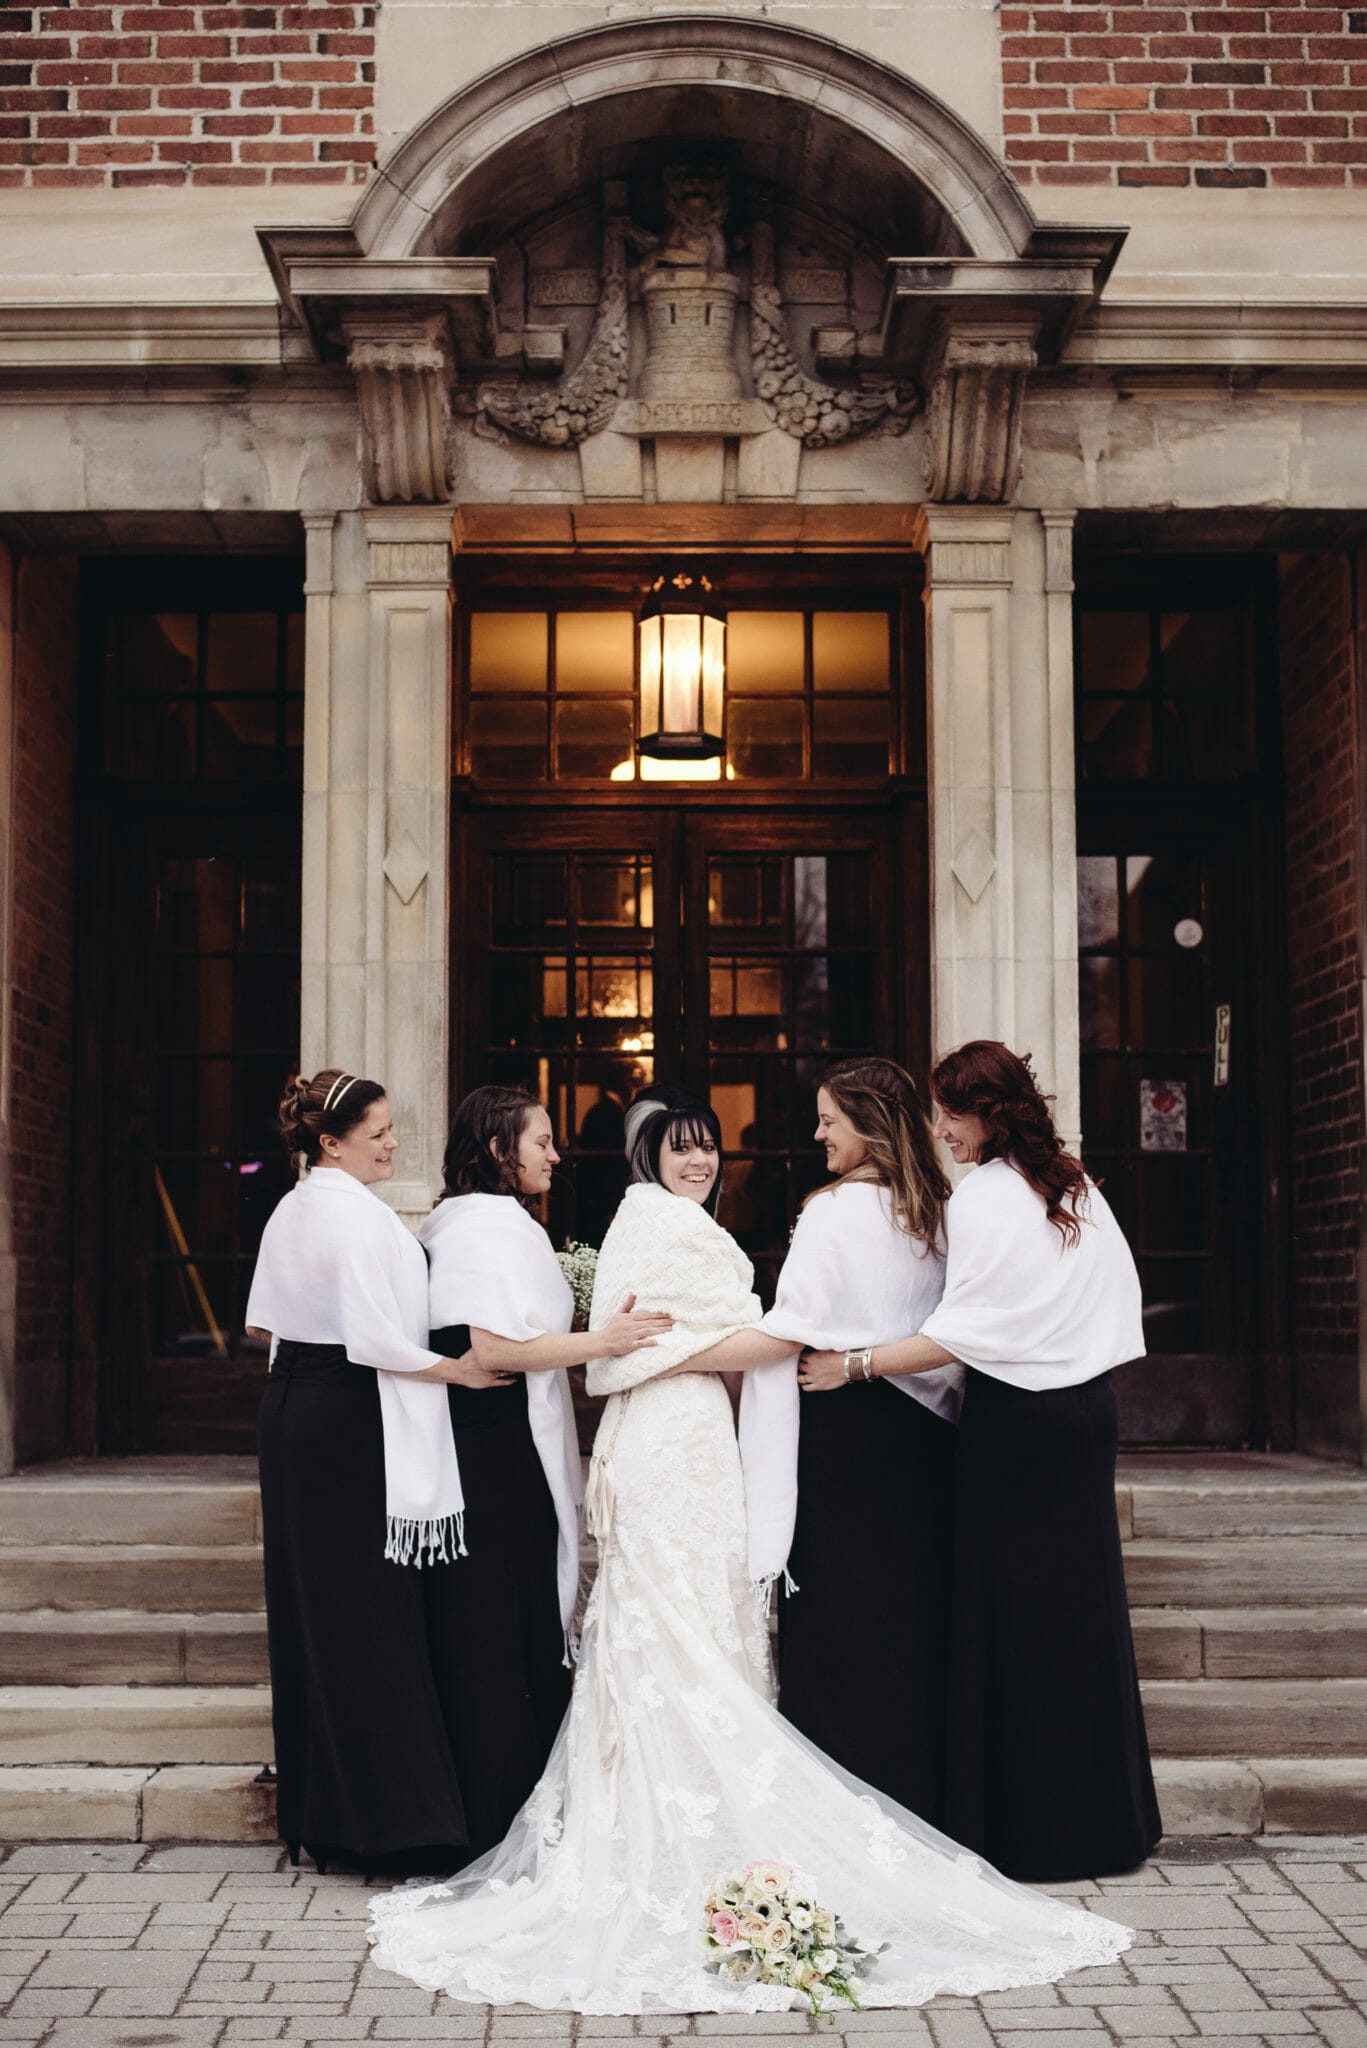 bridesmaid photo at newcastle community hall wedding